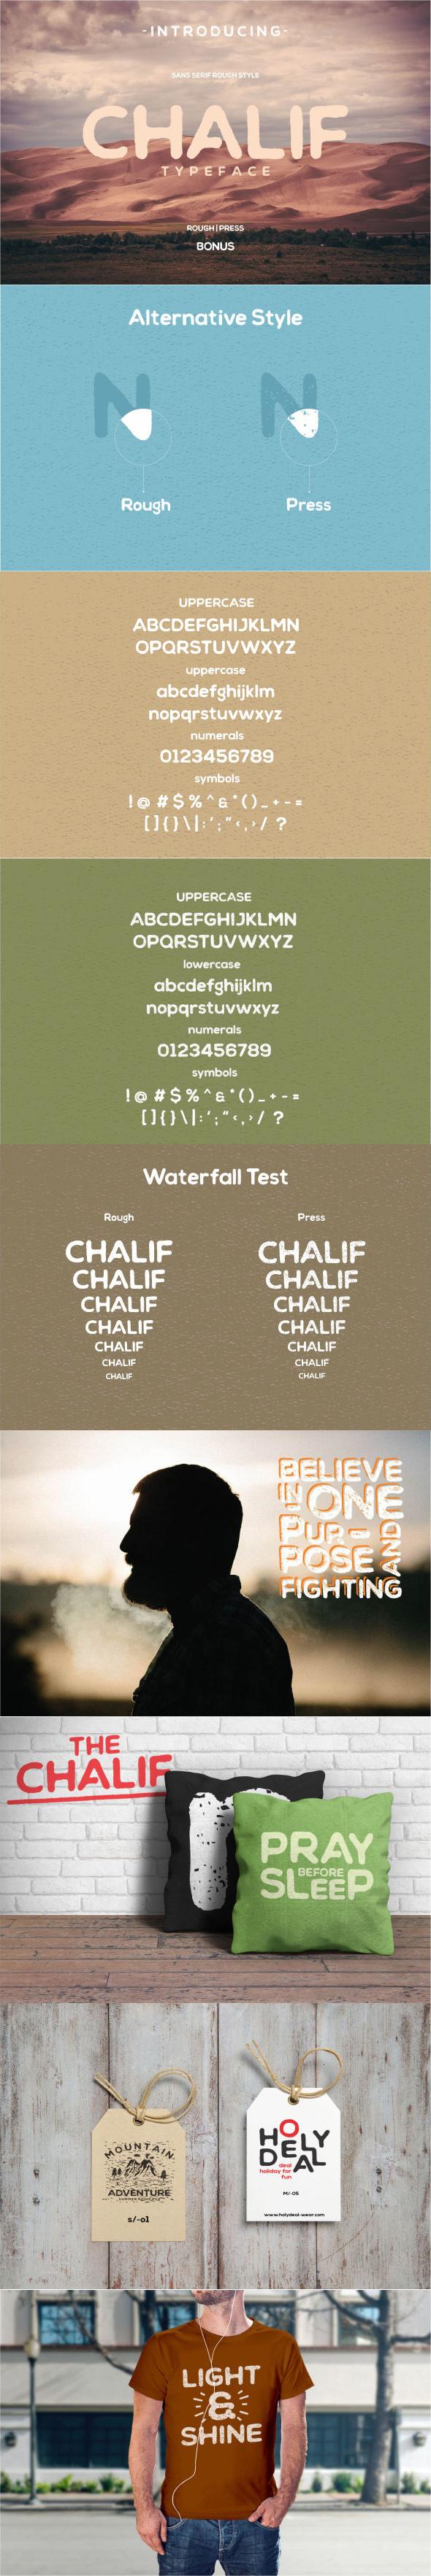 Chalif Typeface - Miscellaneous Sans-Serif